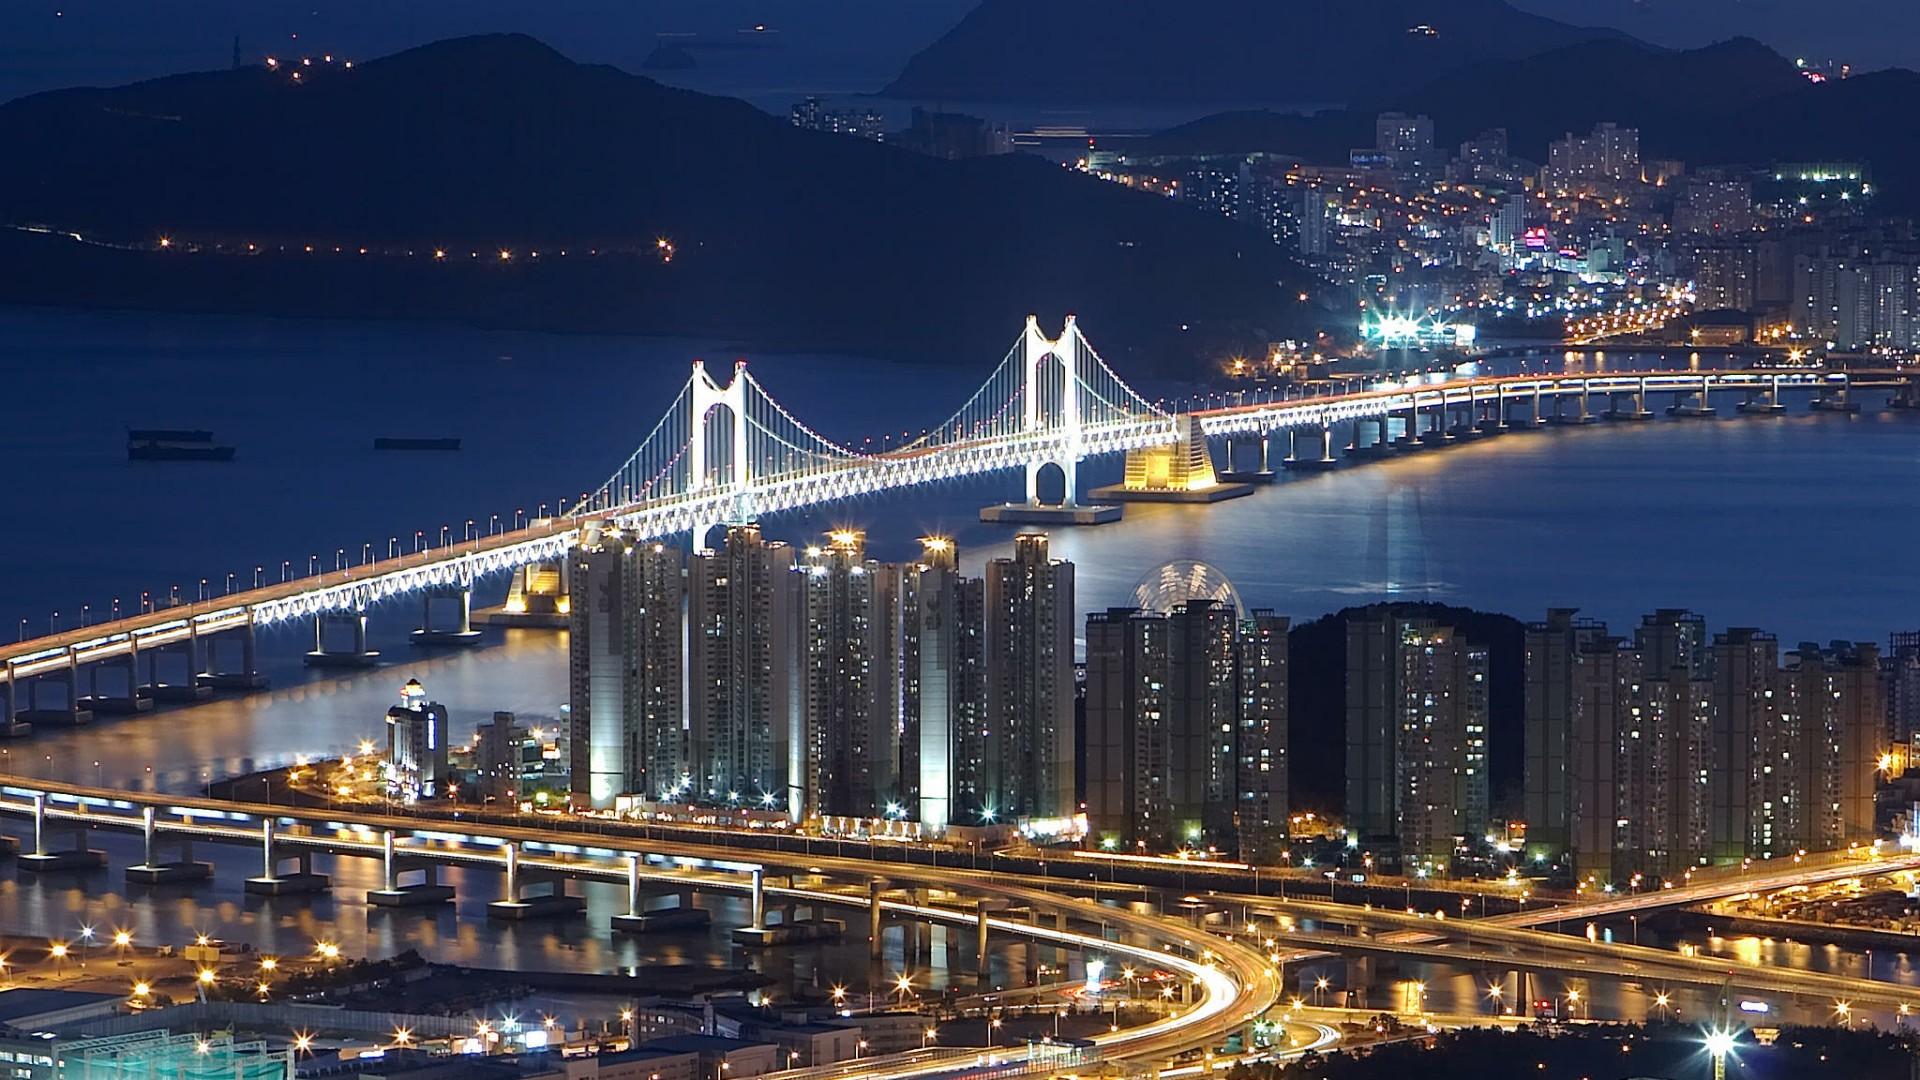 Seoul at night wallpaper